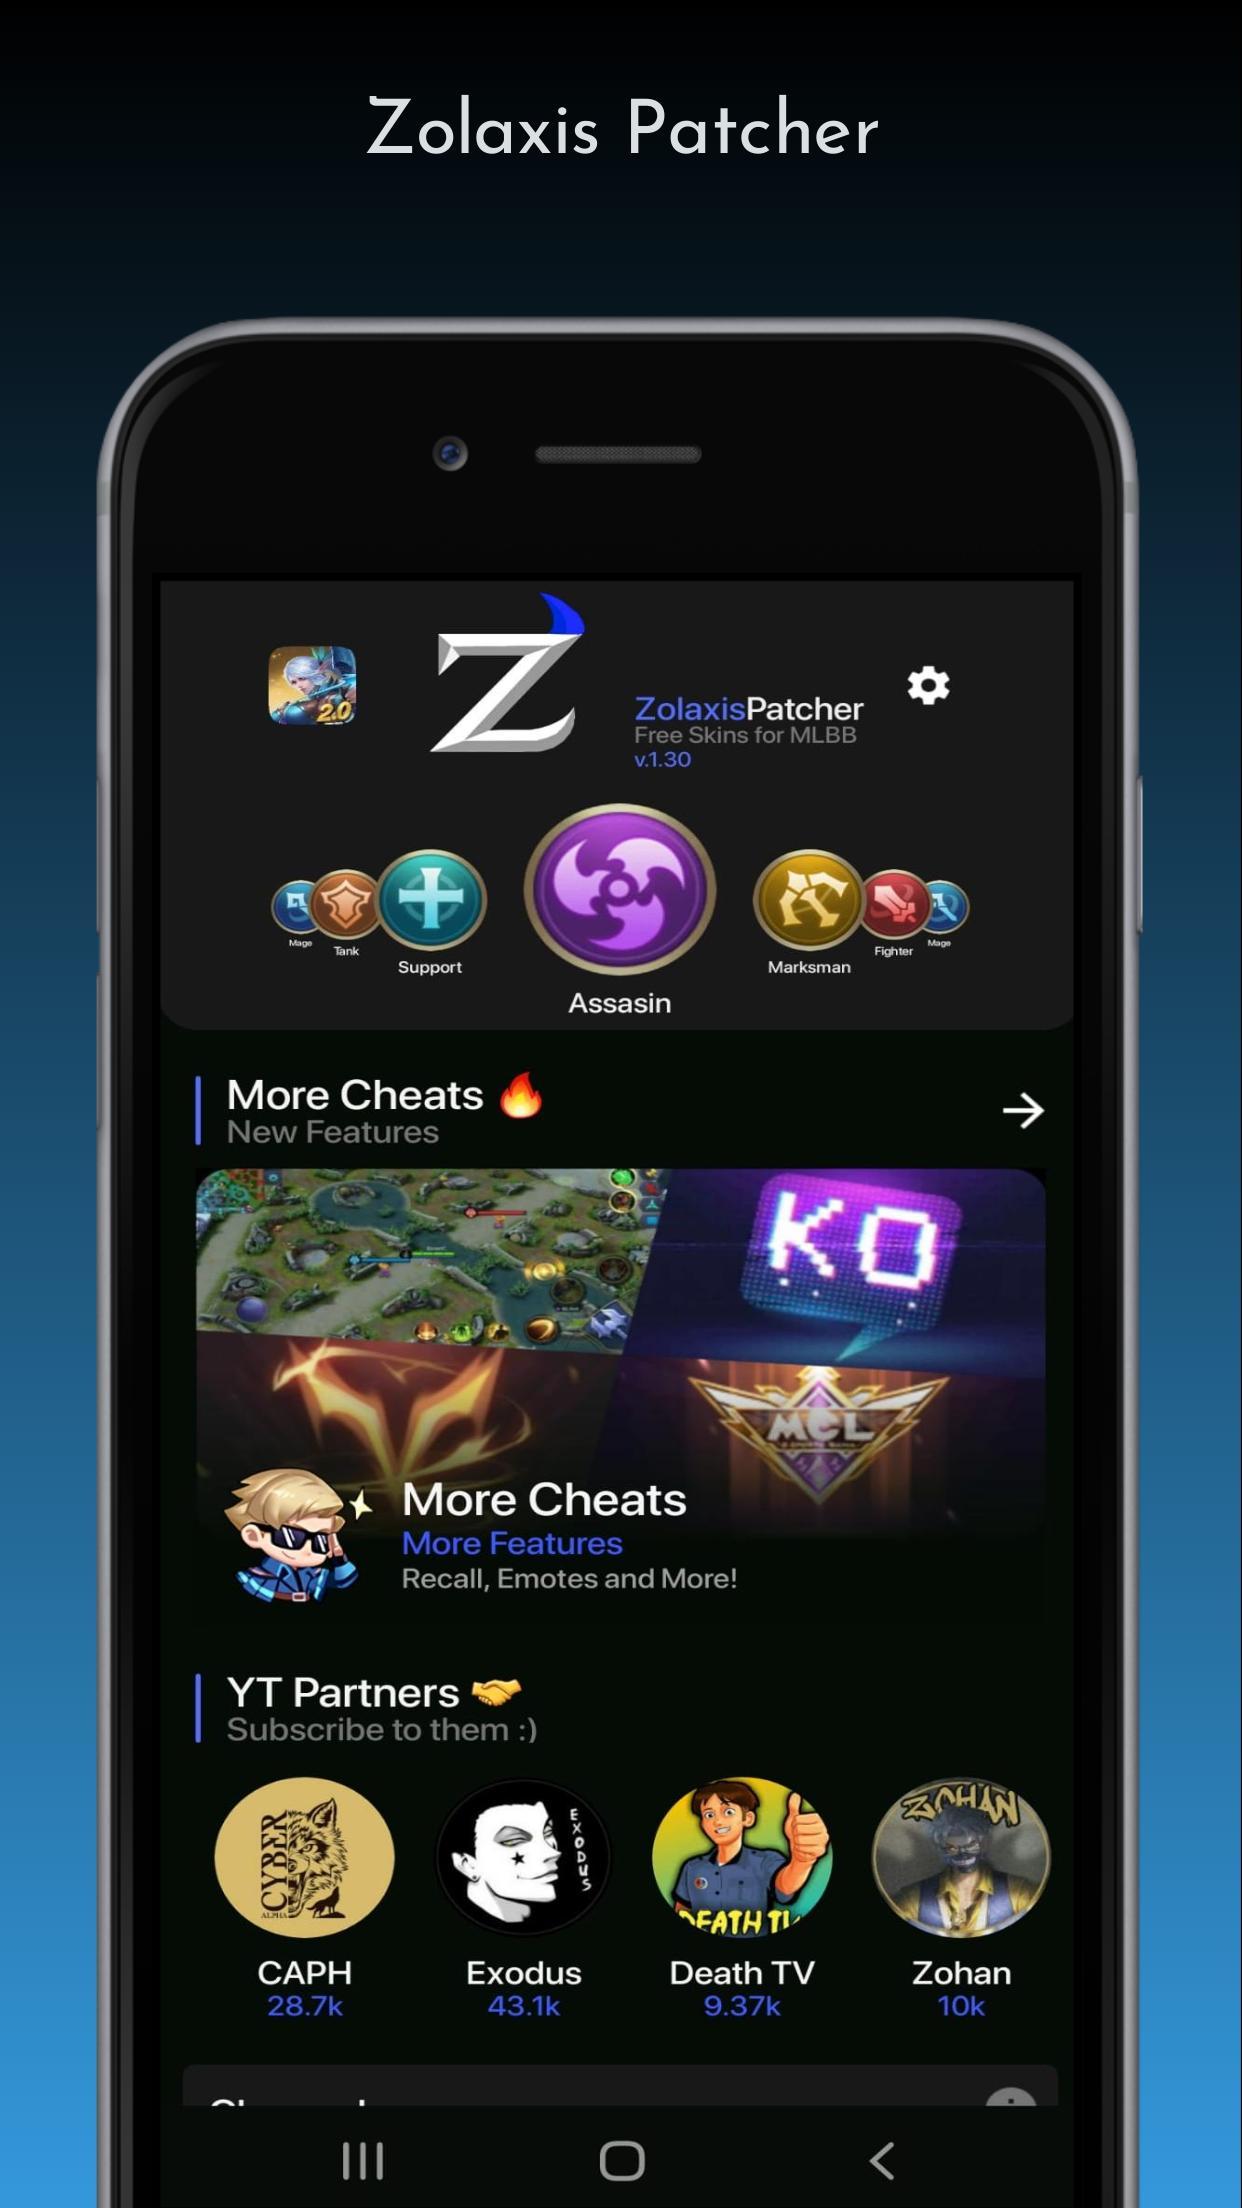 Kelebihan-Zolaxis-Patcher-Apk-Unlock-Skin-Mobile-Legends